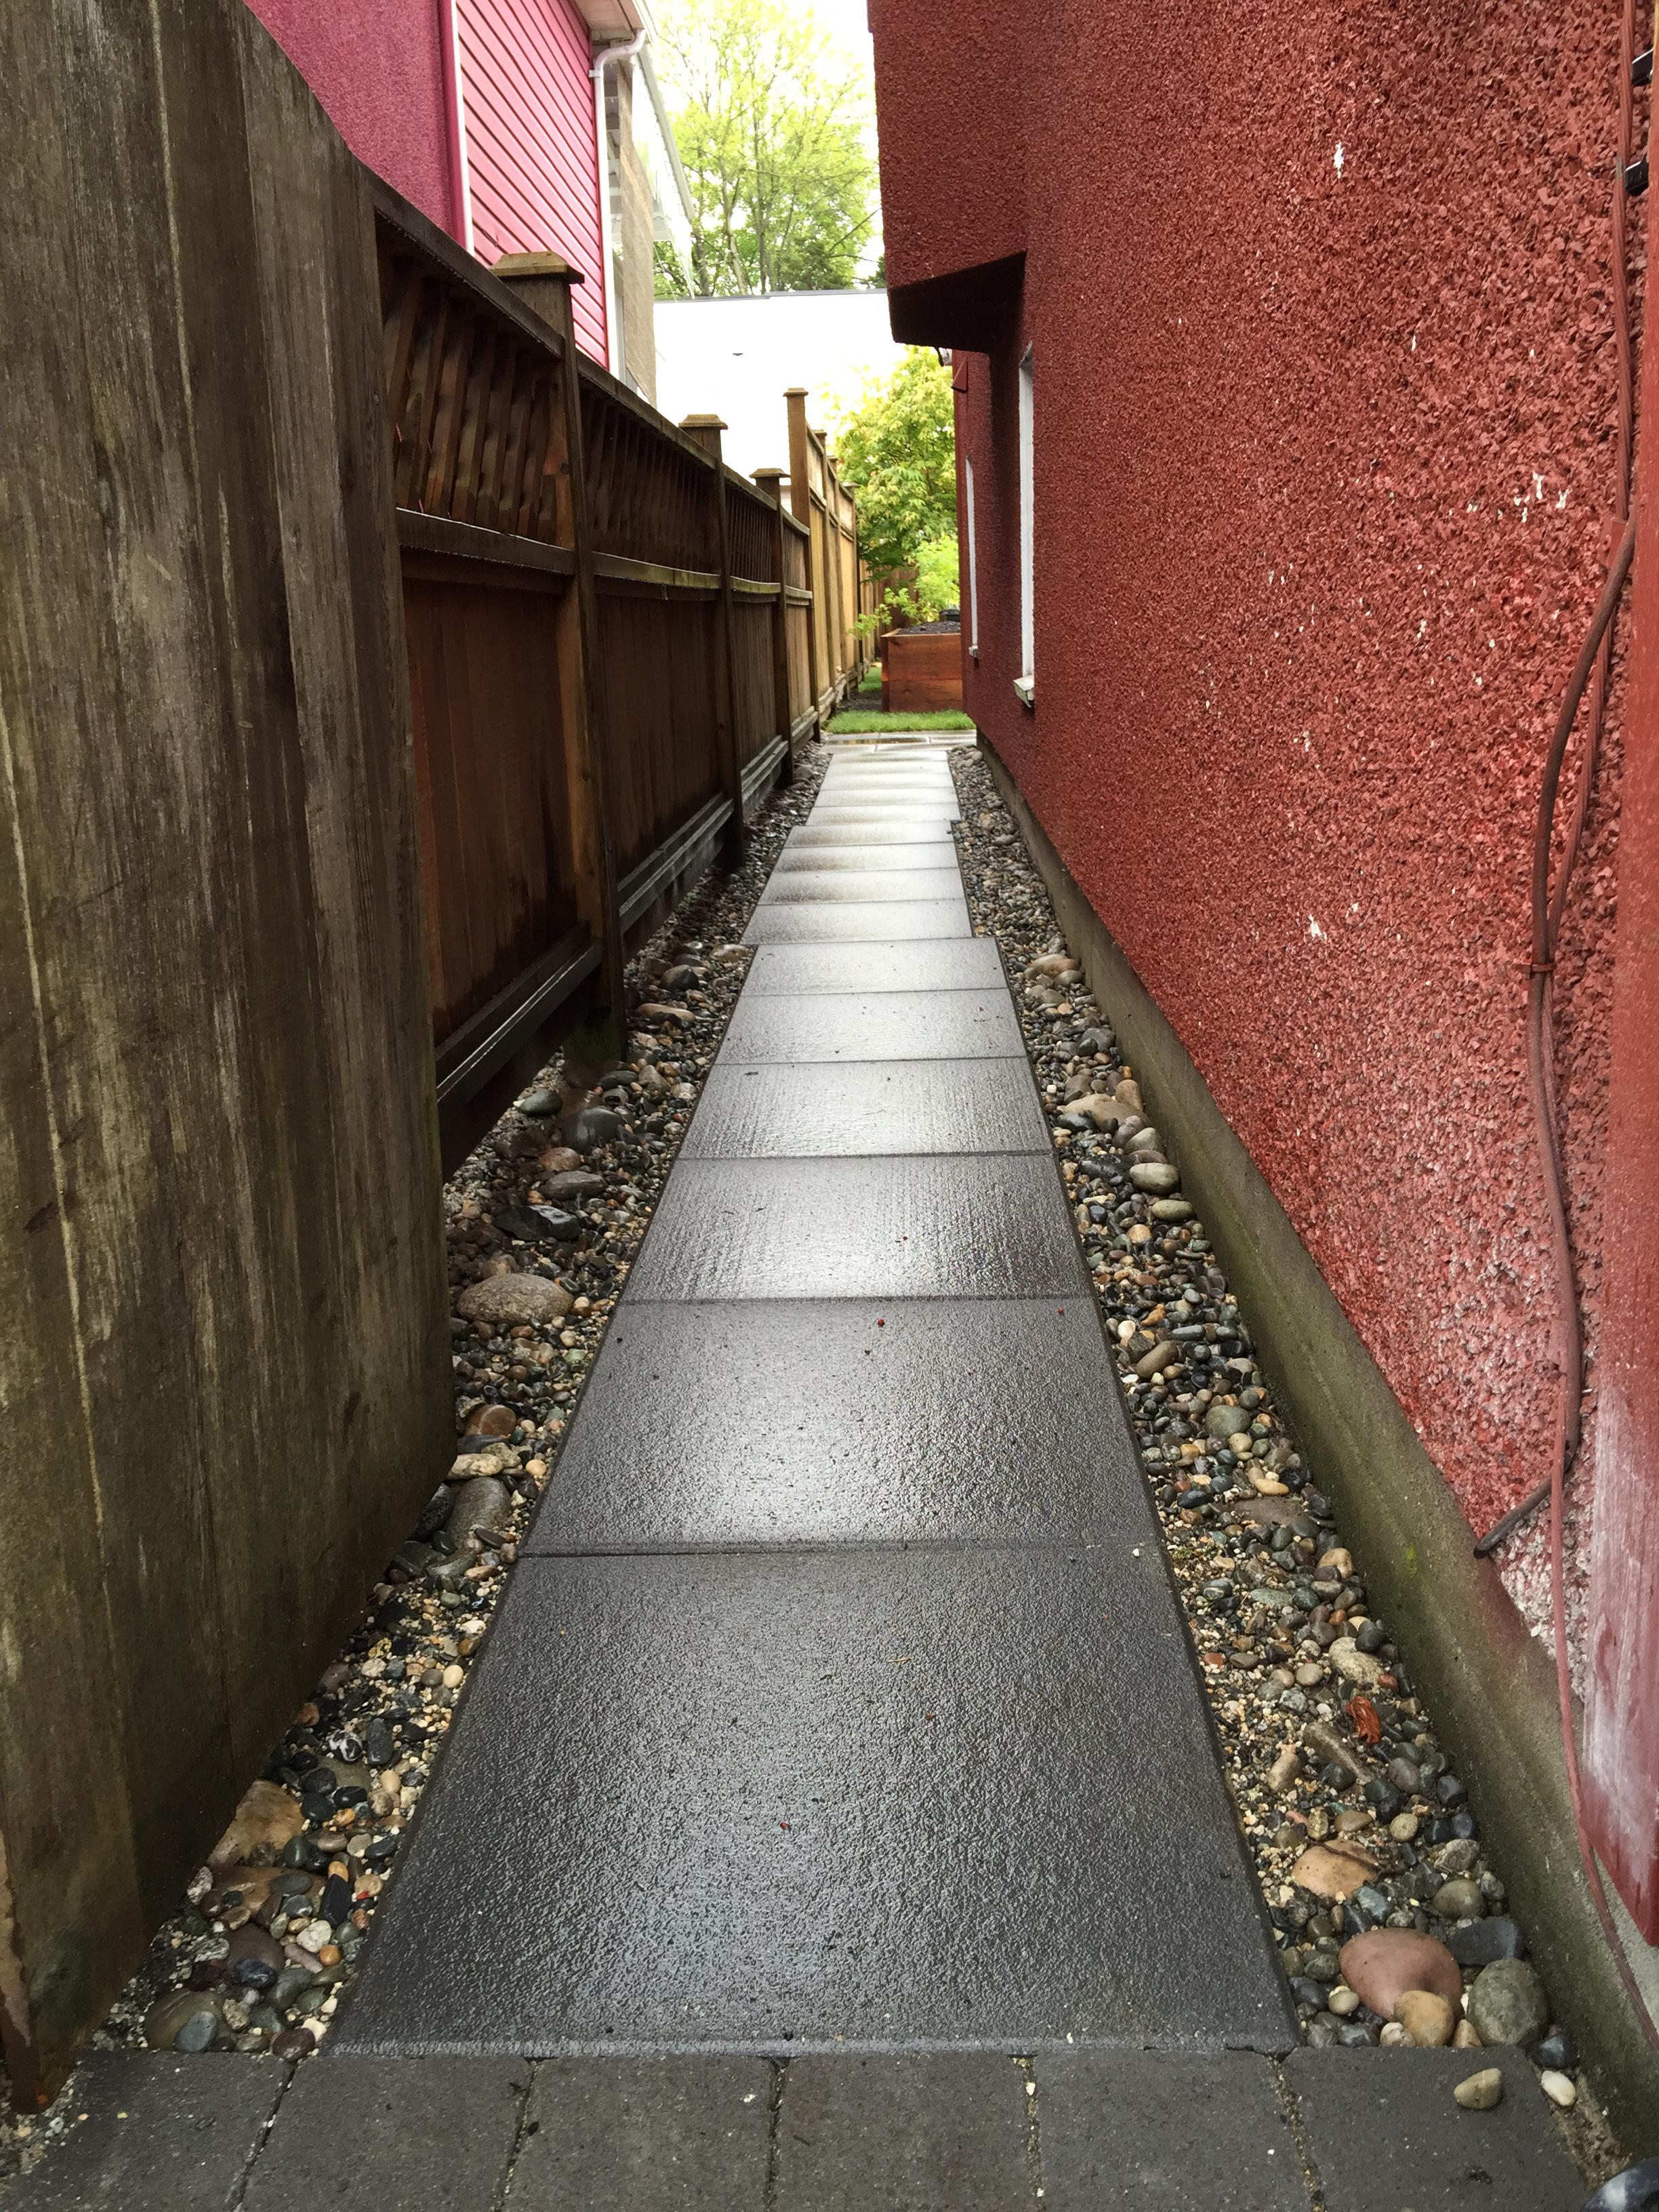 Concrete slab walkway